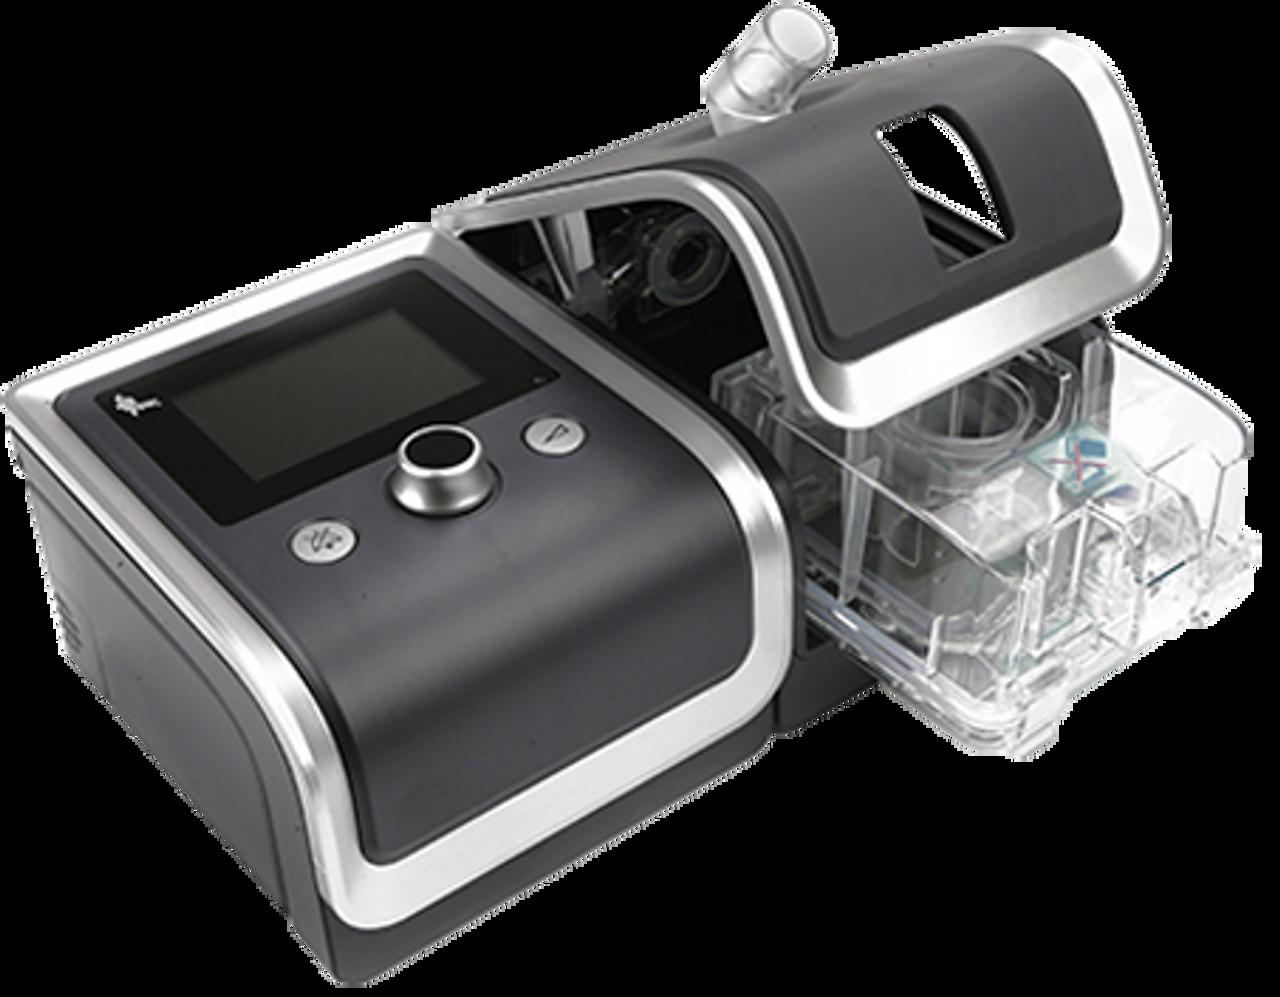 BMC Luna CPAP System